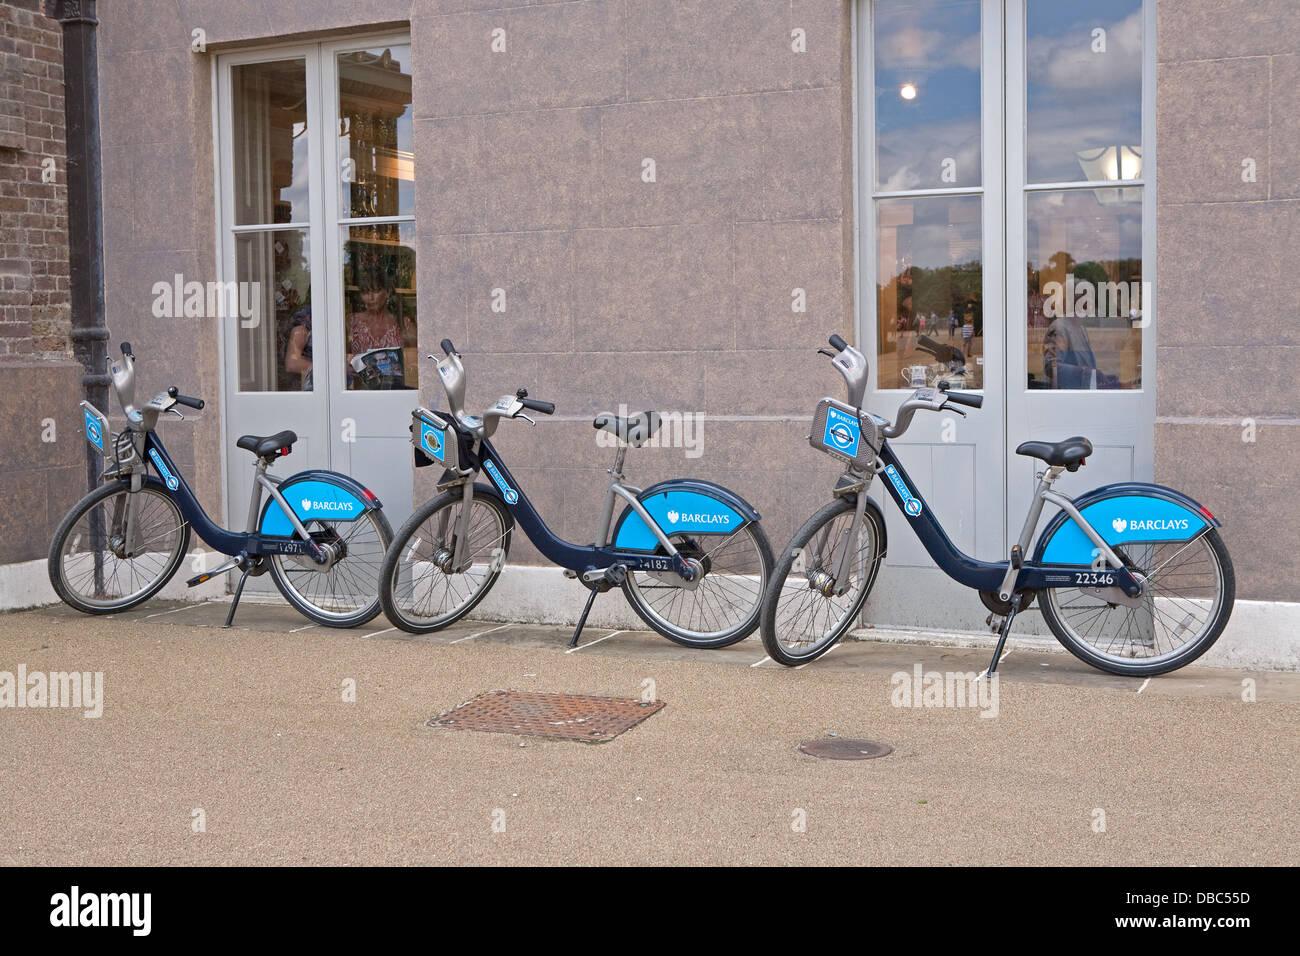 3 Boris bikes parked outside Kensington Palace in London Stock Photo